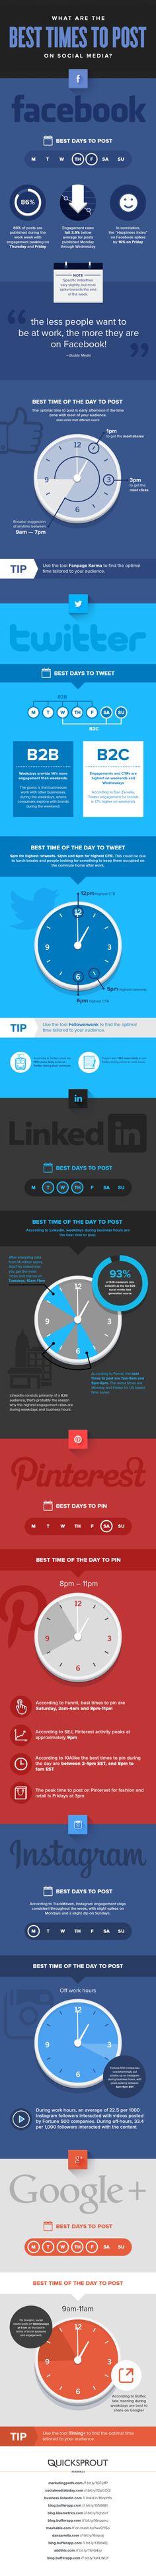 The Best Times to Post on Social Media   #SMM #SocialMediaTips